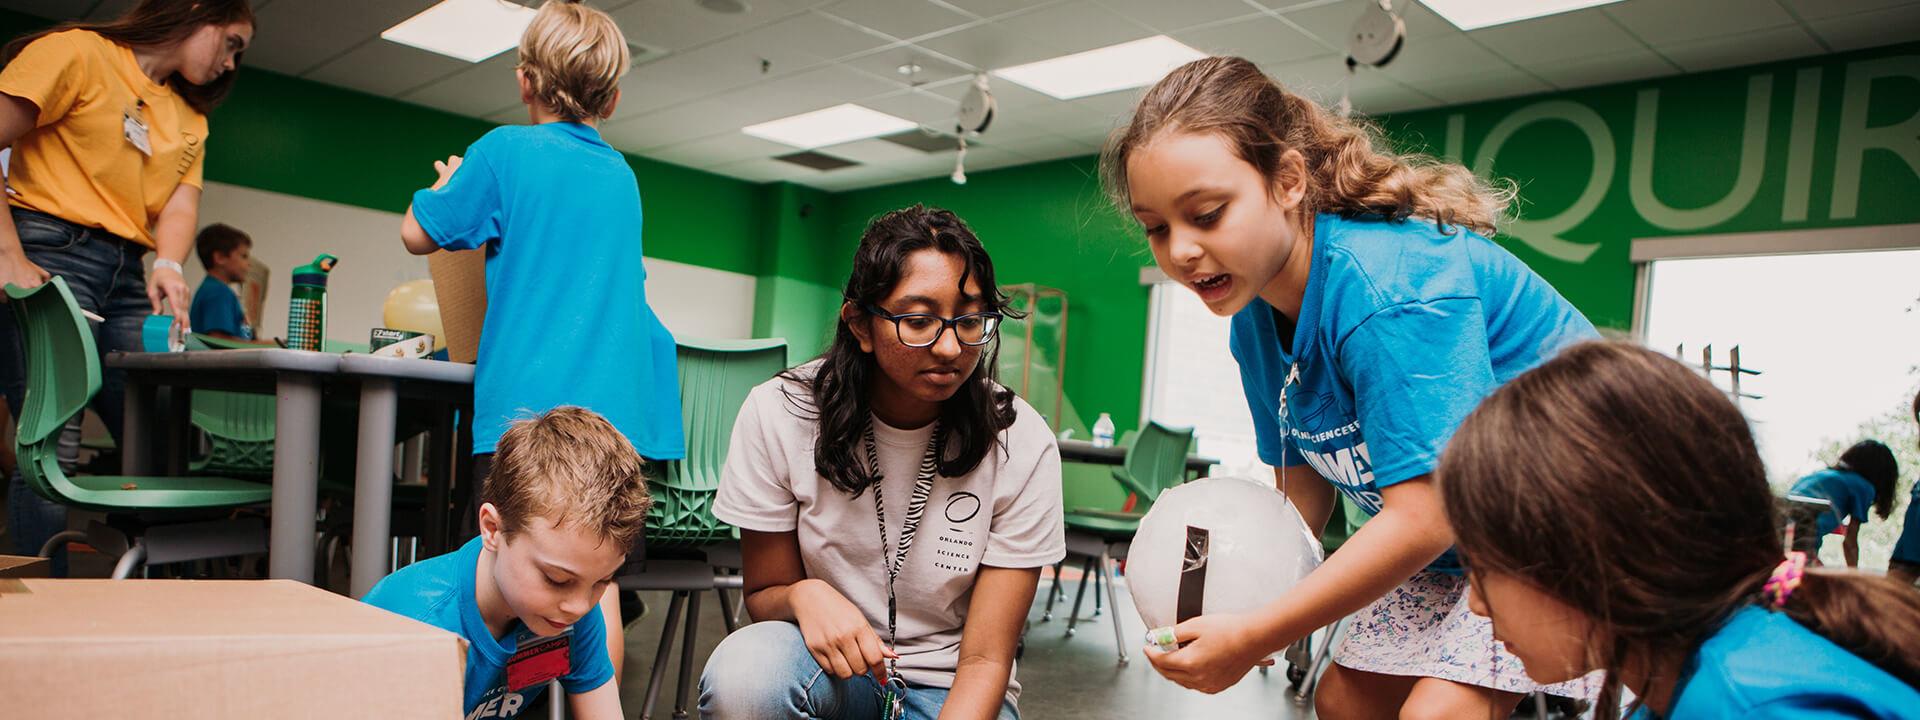 teenagers-volunteering-orlando-education-kids